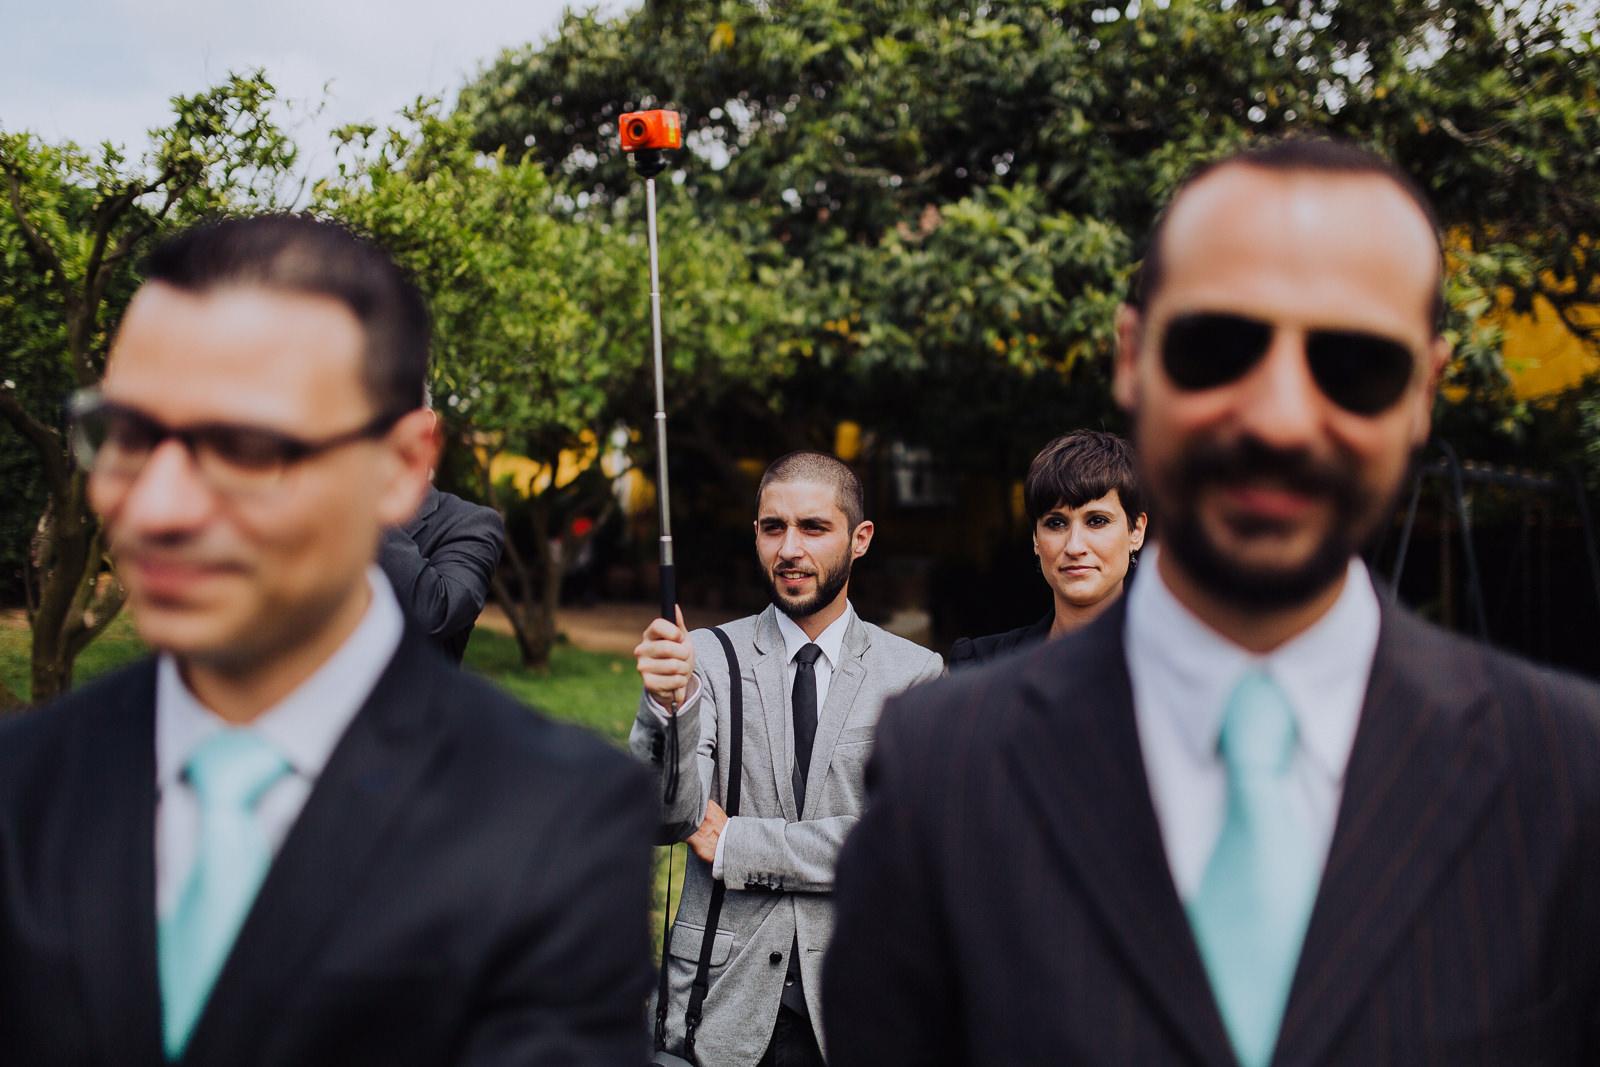 wedding_quinta_santana_mafra_portugal_065.jpg